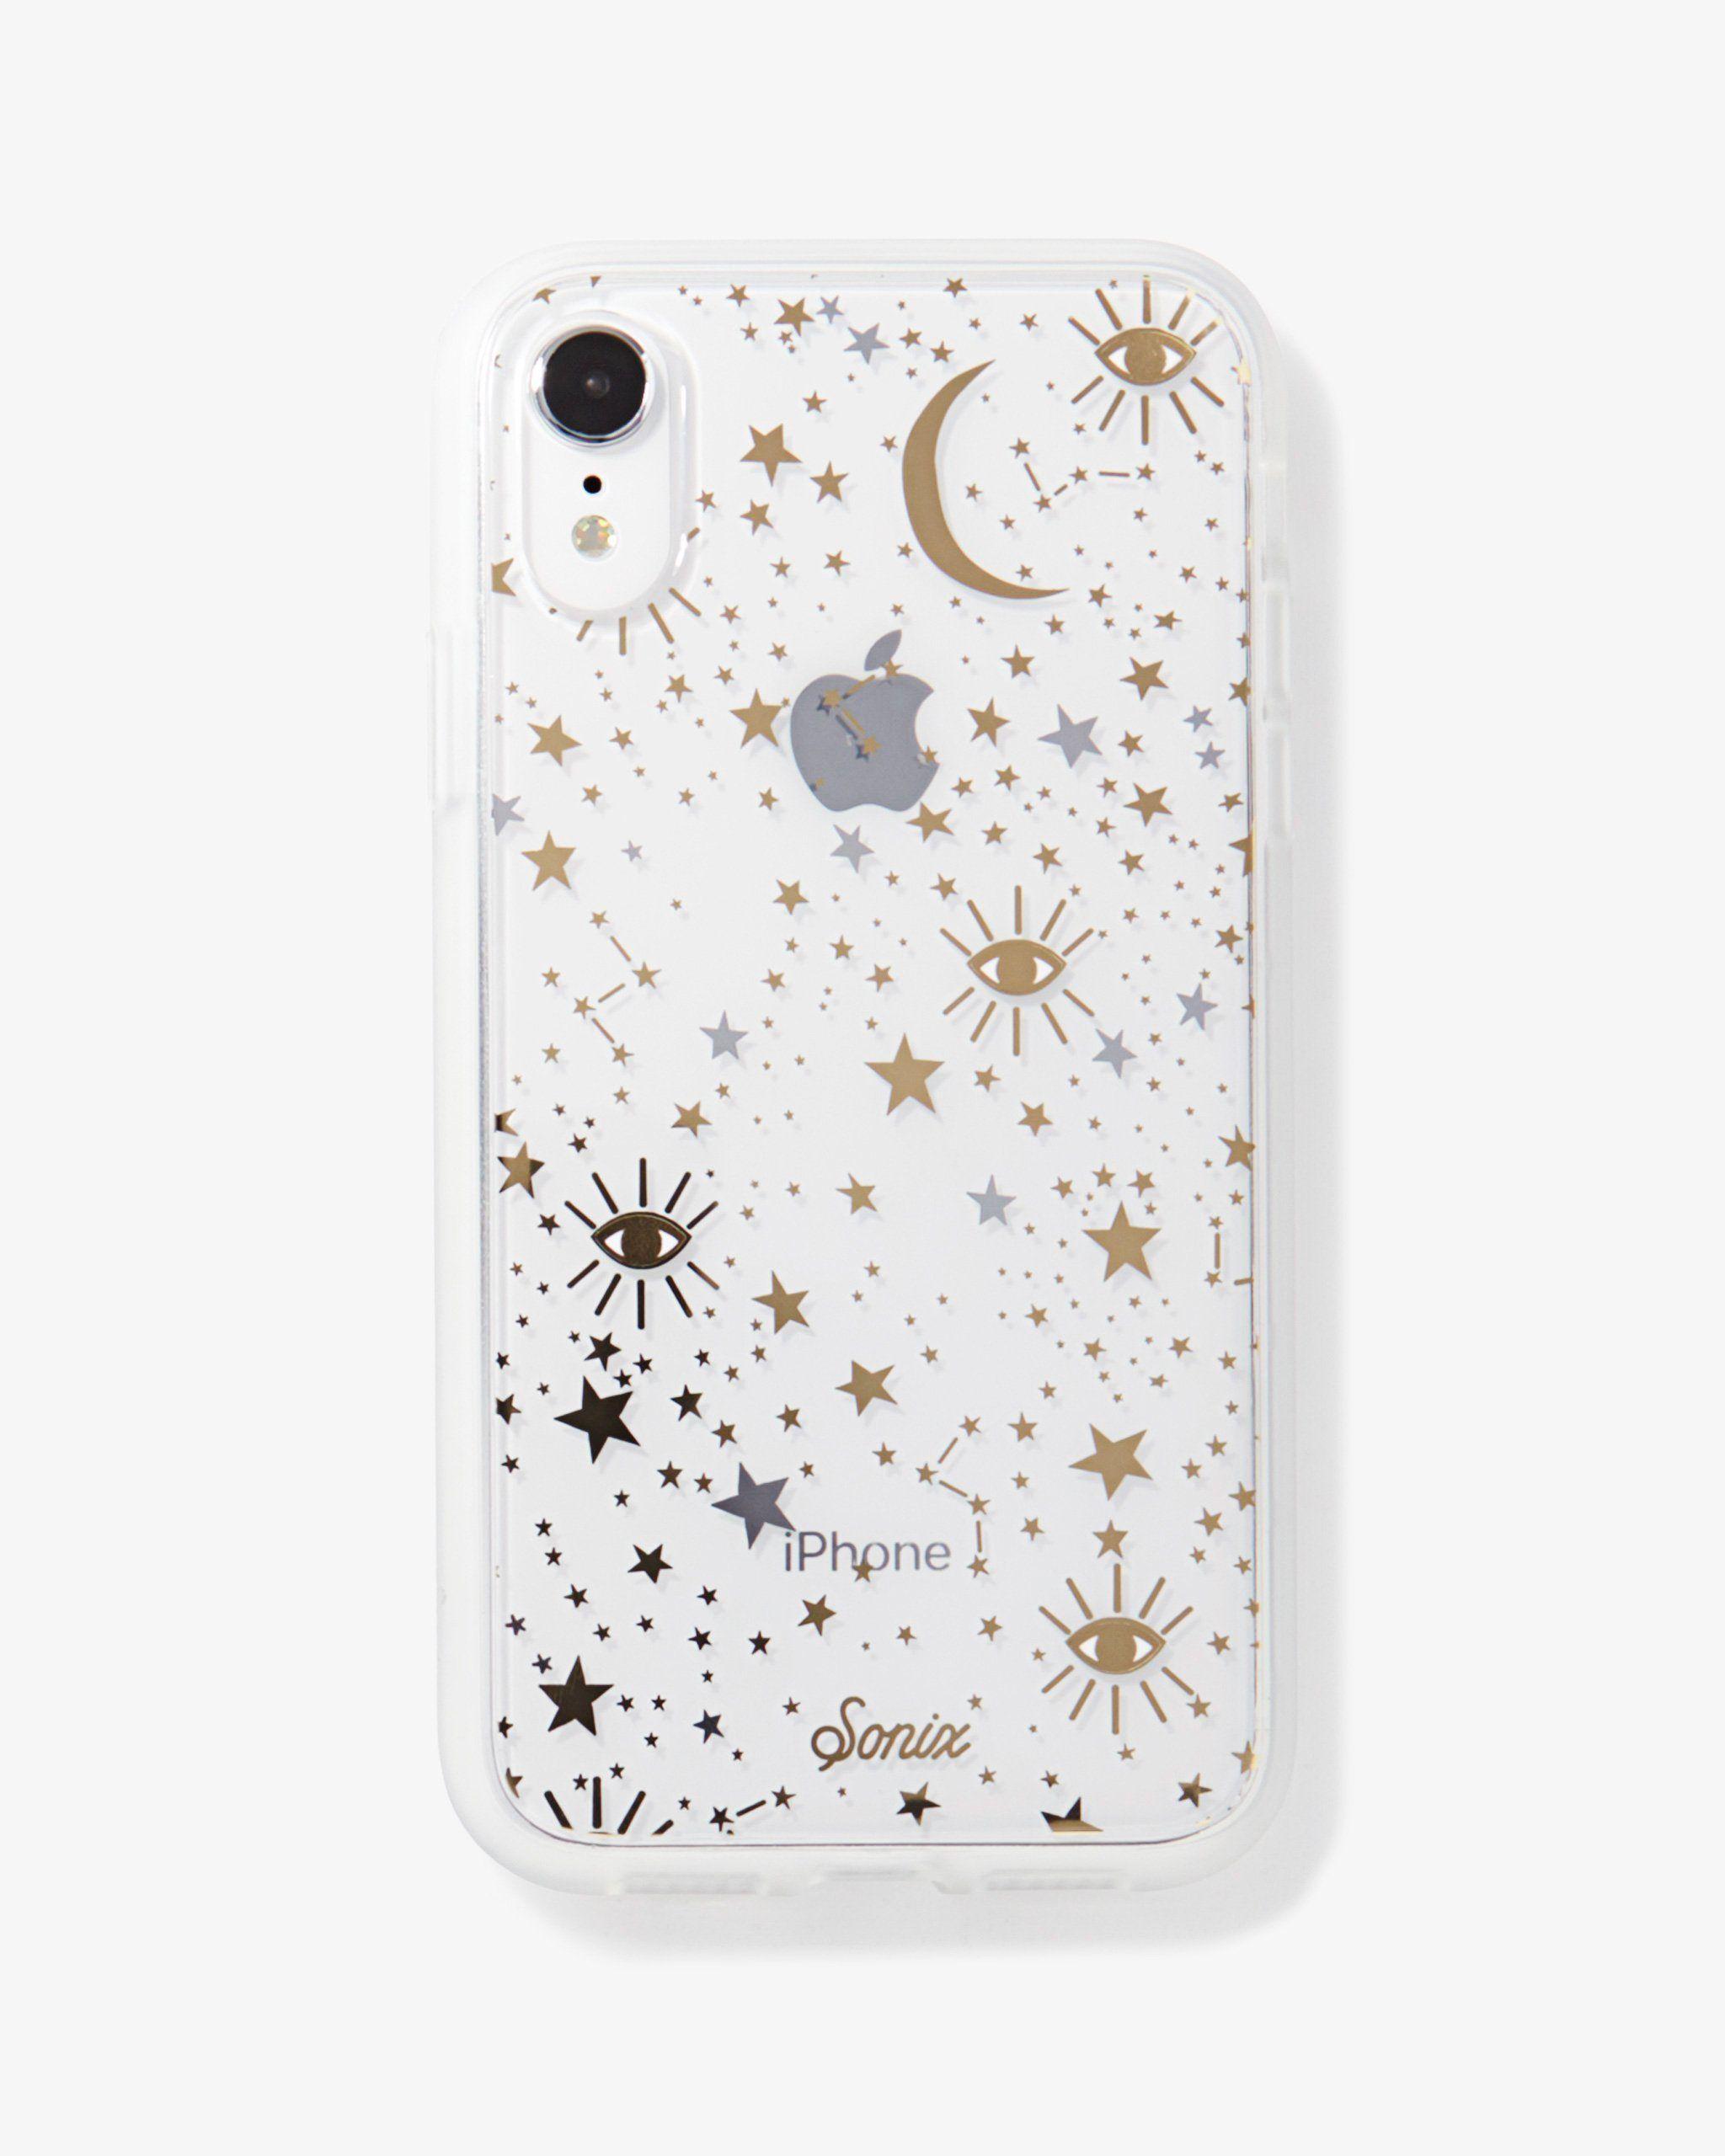 Cosmic iphone xr iphone phone iphone phone cases